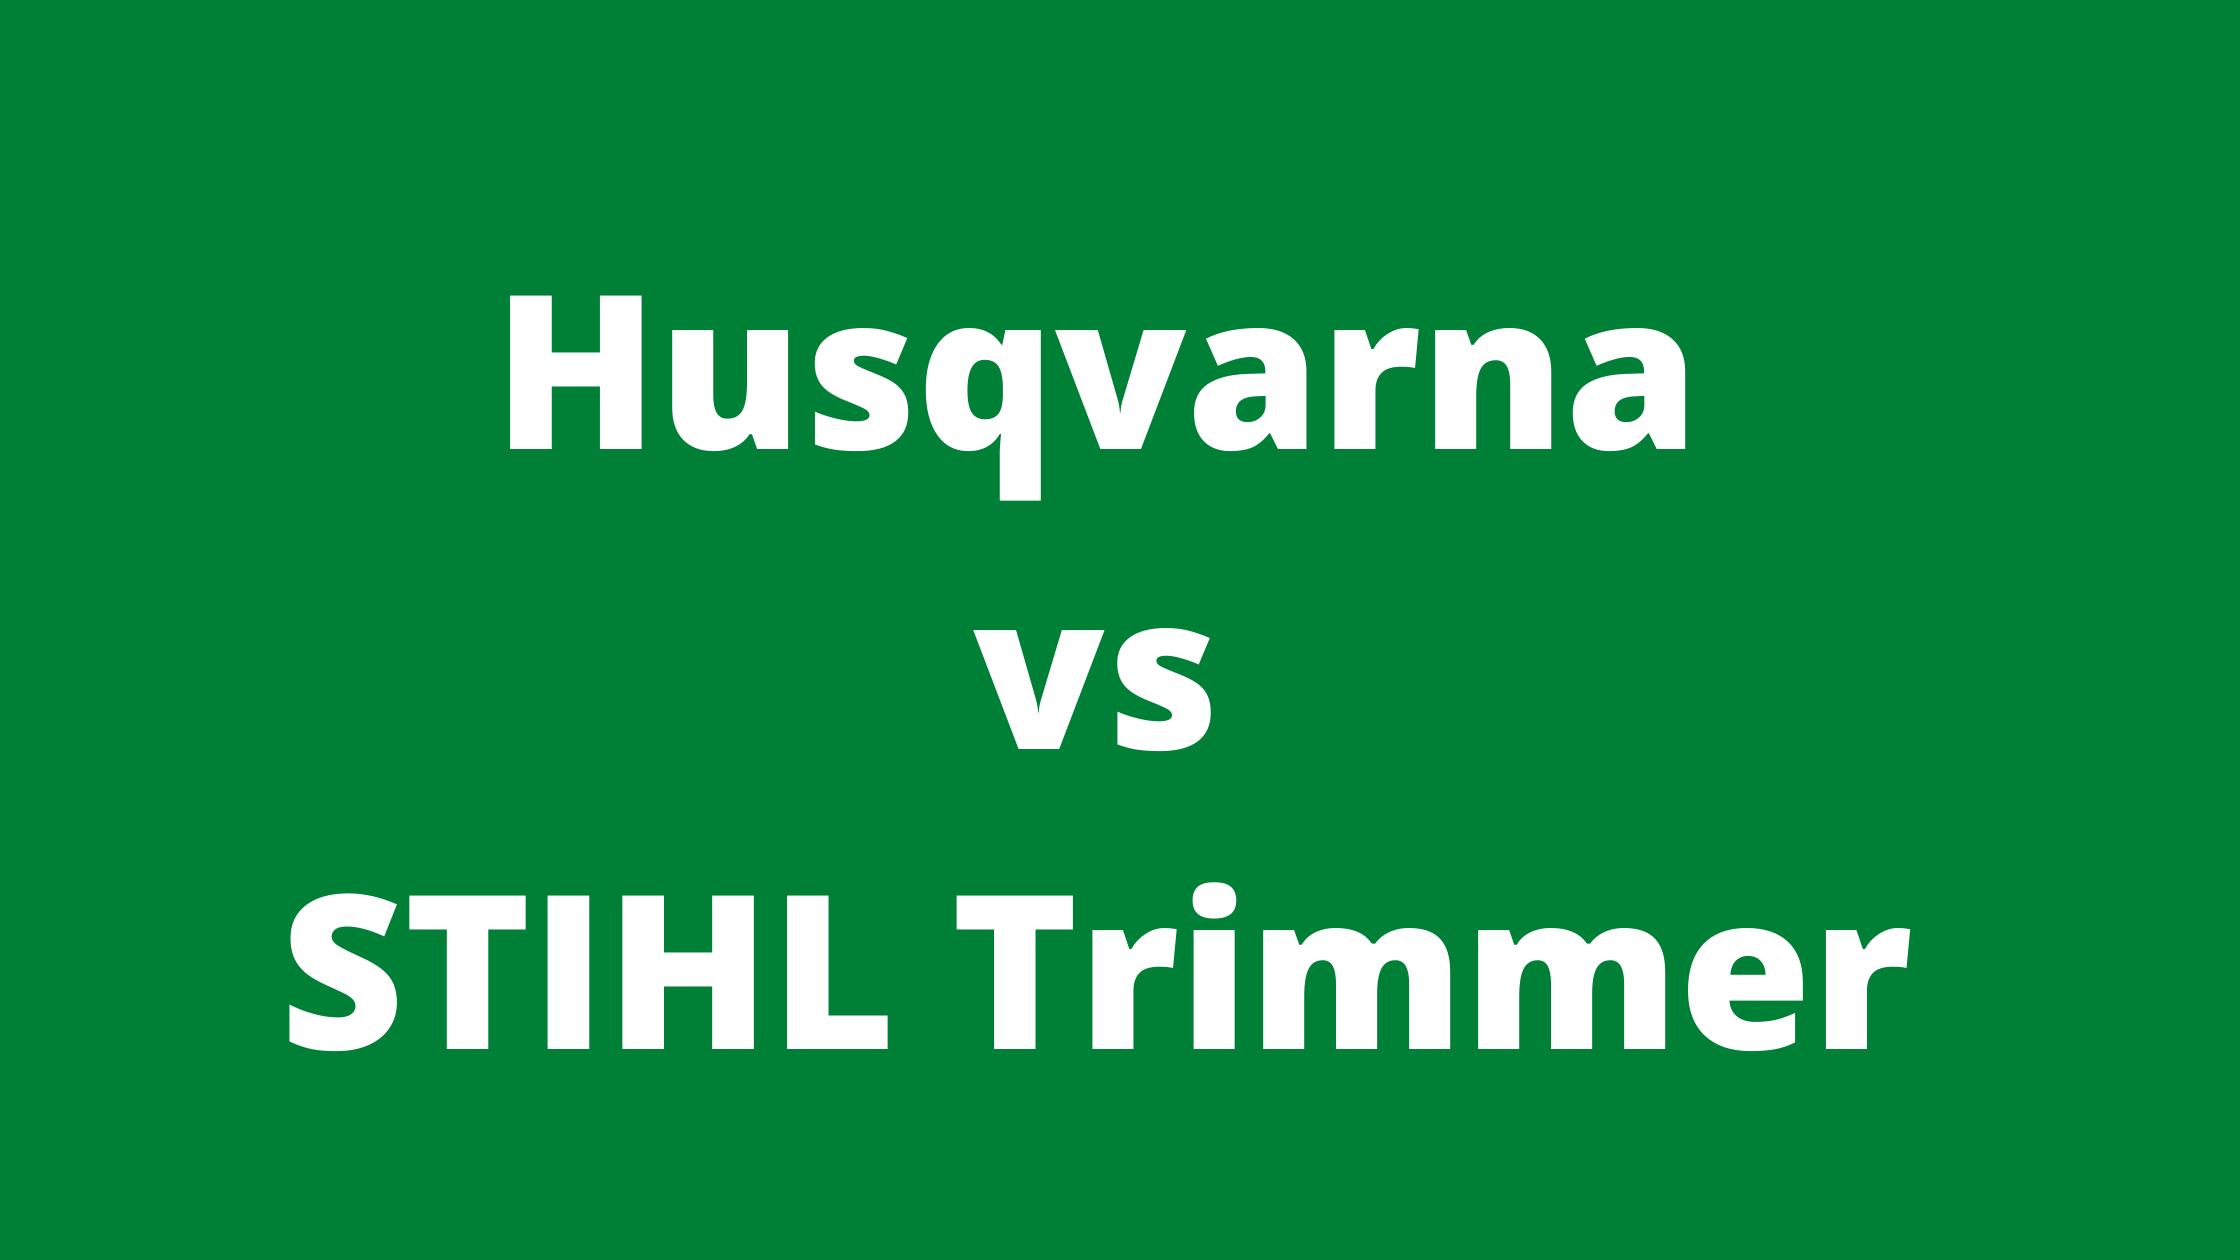 Husqvarna vs STIHL Trimmer: What Brand Has The Better Trimmer?